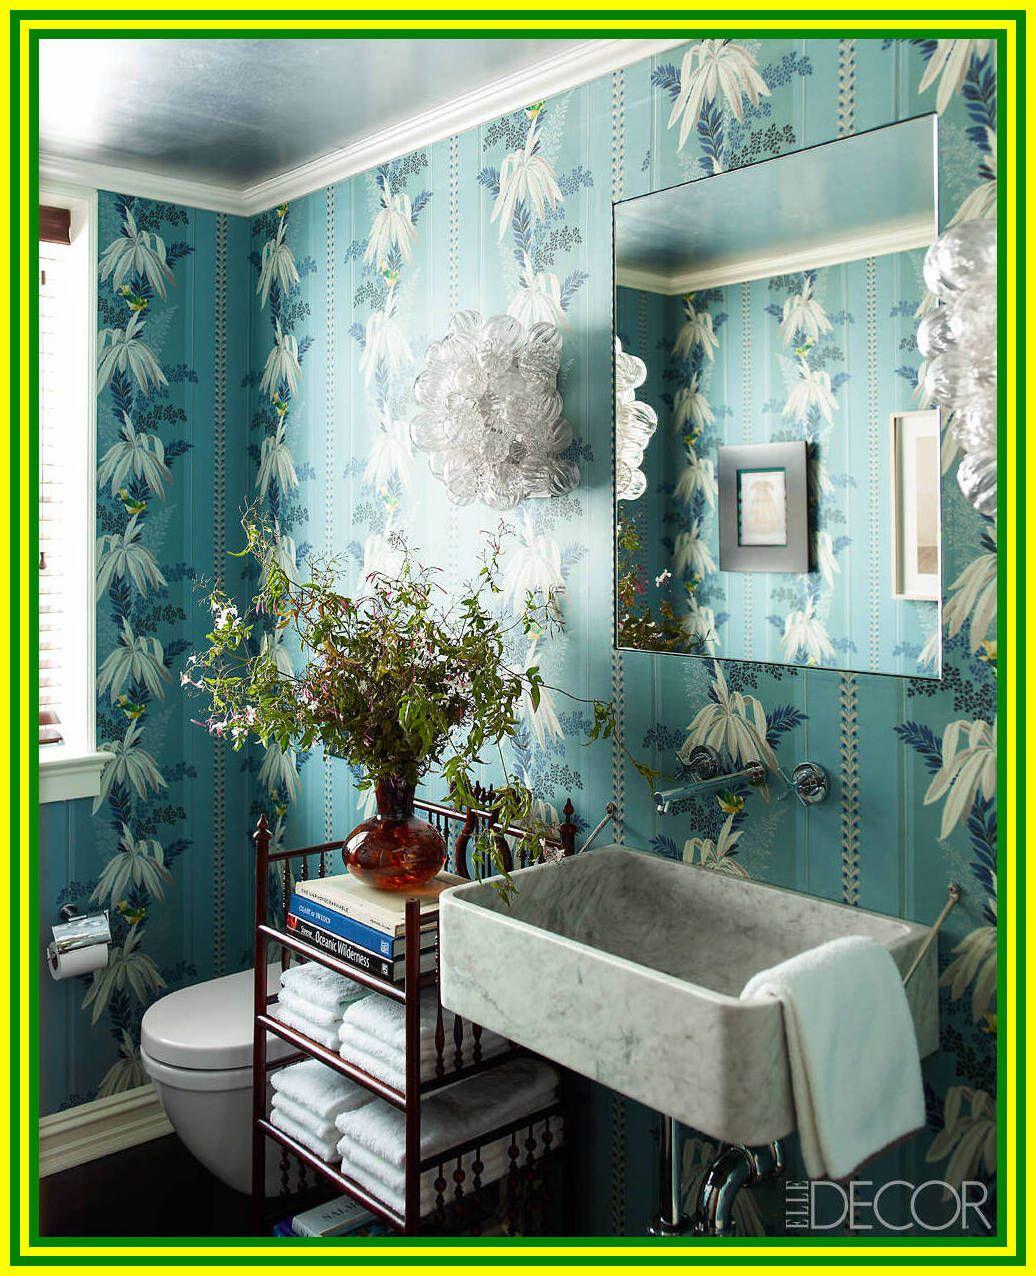 87 Reference Of Bathroom Decor Wallpaper Bathroom Wall Coverings Bathroom Decor Bathrooms Remodel